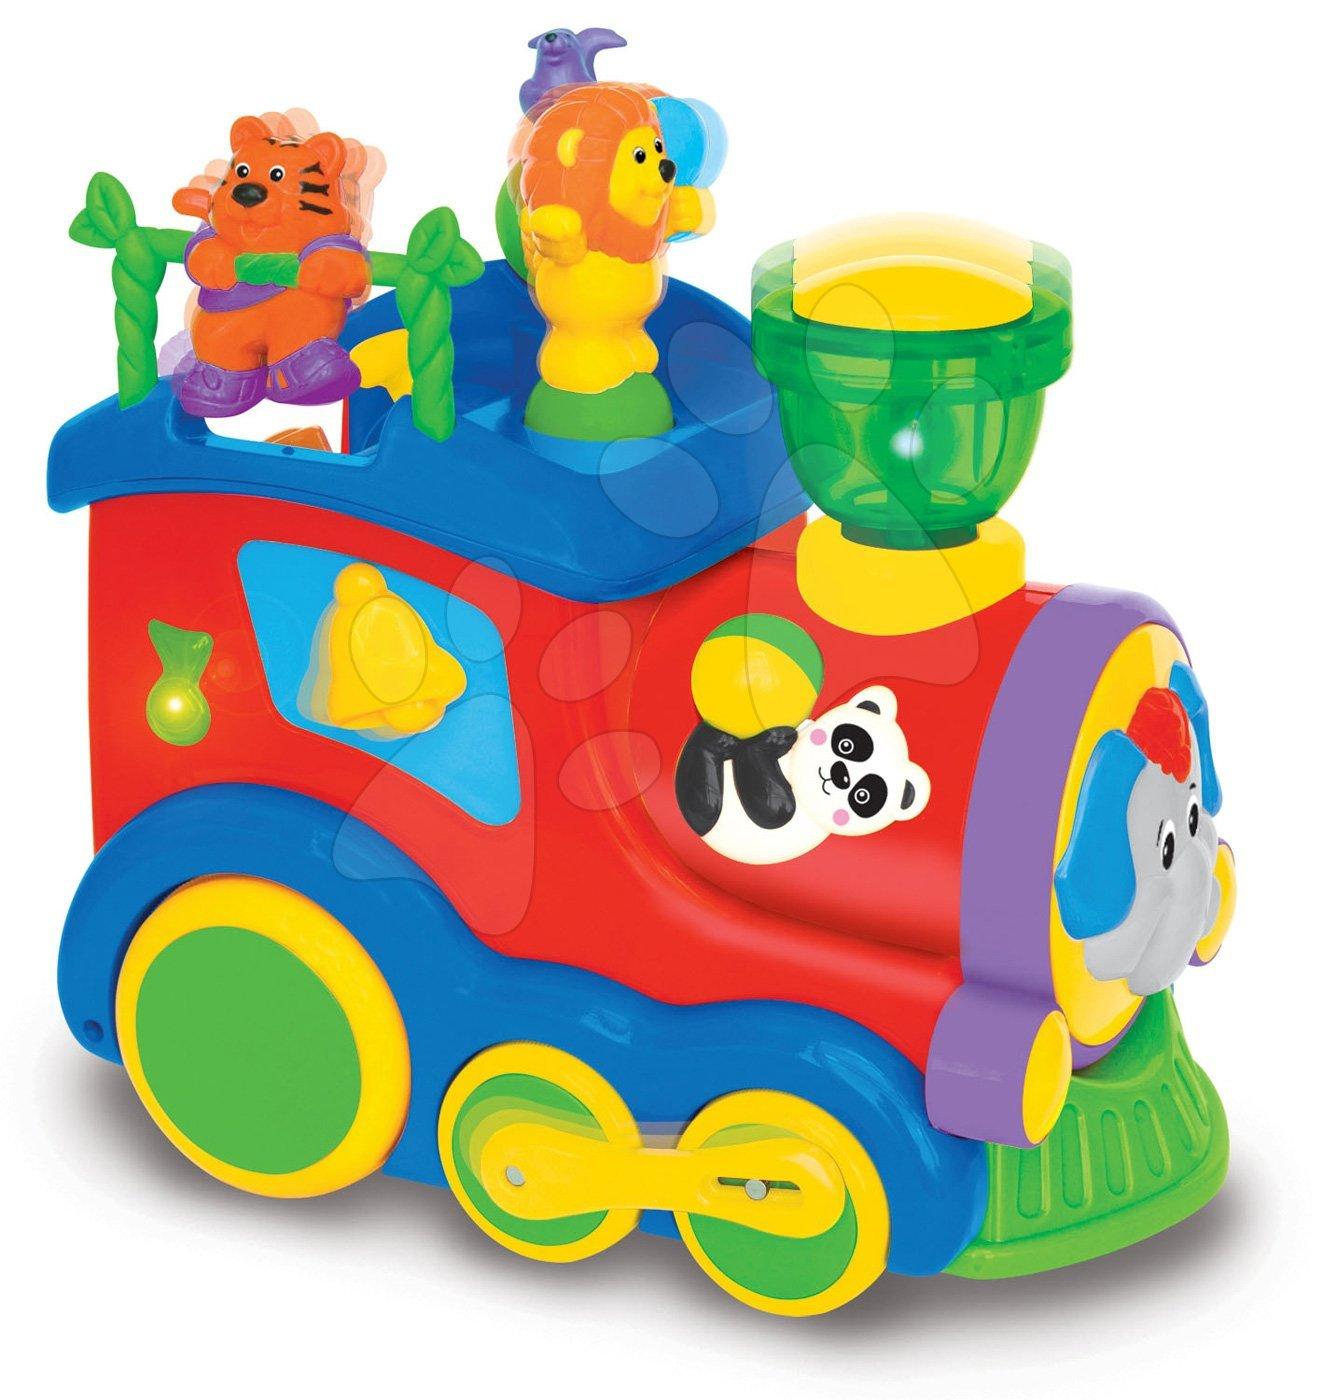 Cirkuška lokomotiva Activity Circus Loco Kiddieland z zvokom in lučkami od 12 mes